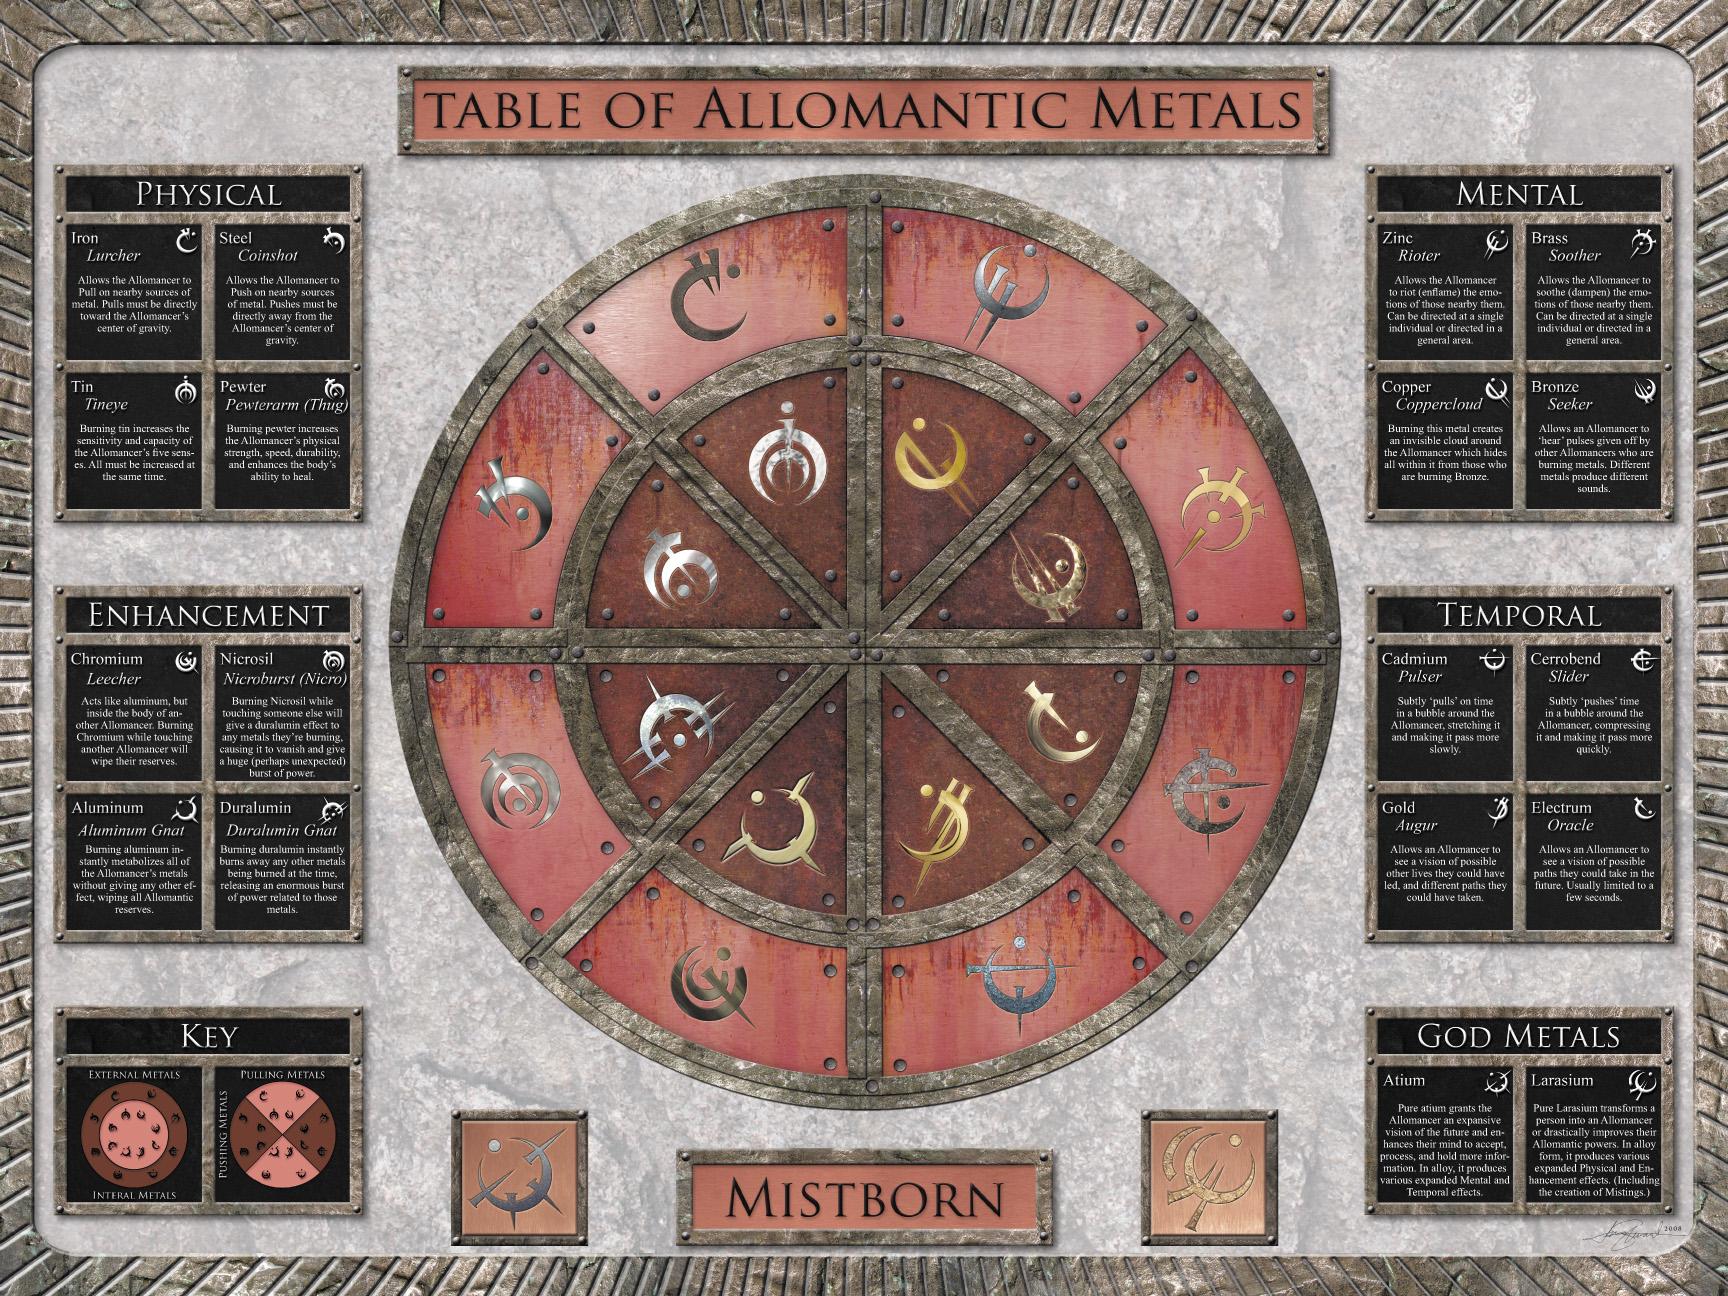 Allomantic Table of Metals | Mistborn Wiki | FANDOM powered